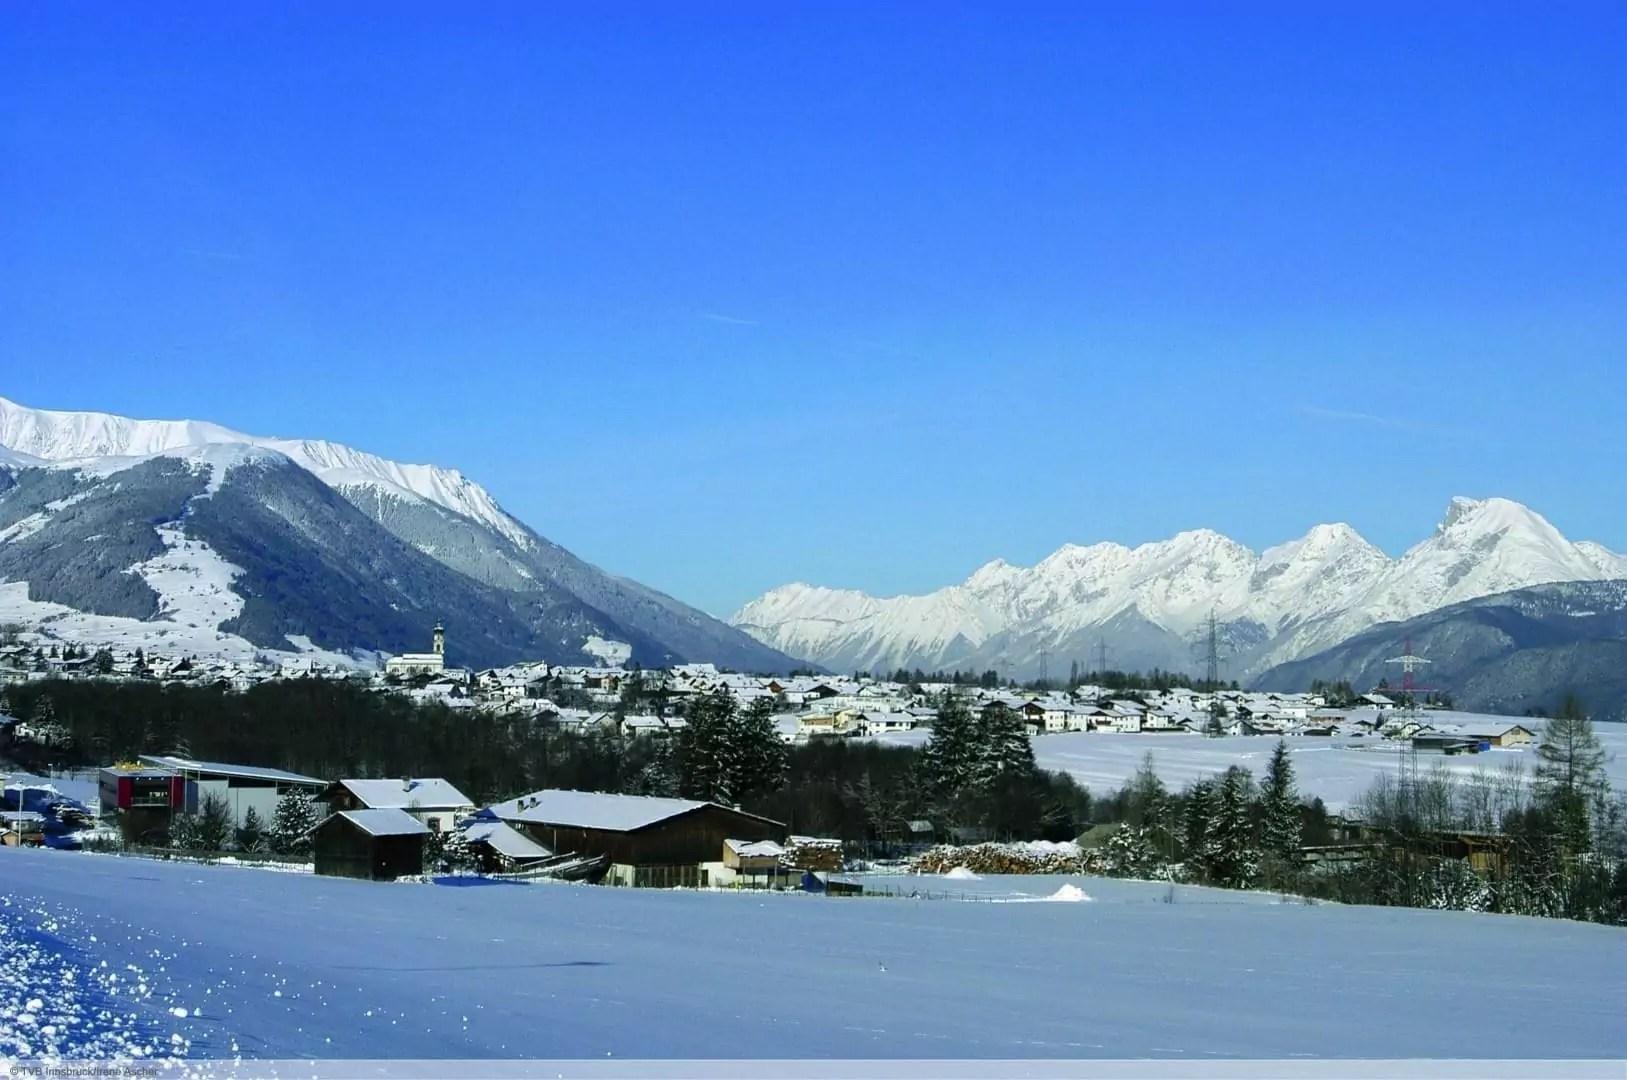 wintersport en aanbiedingen in Götzens